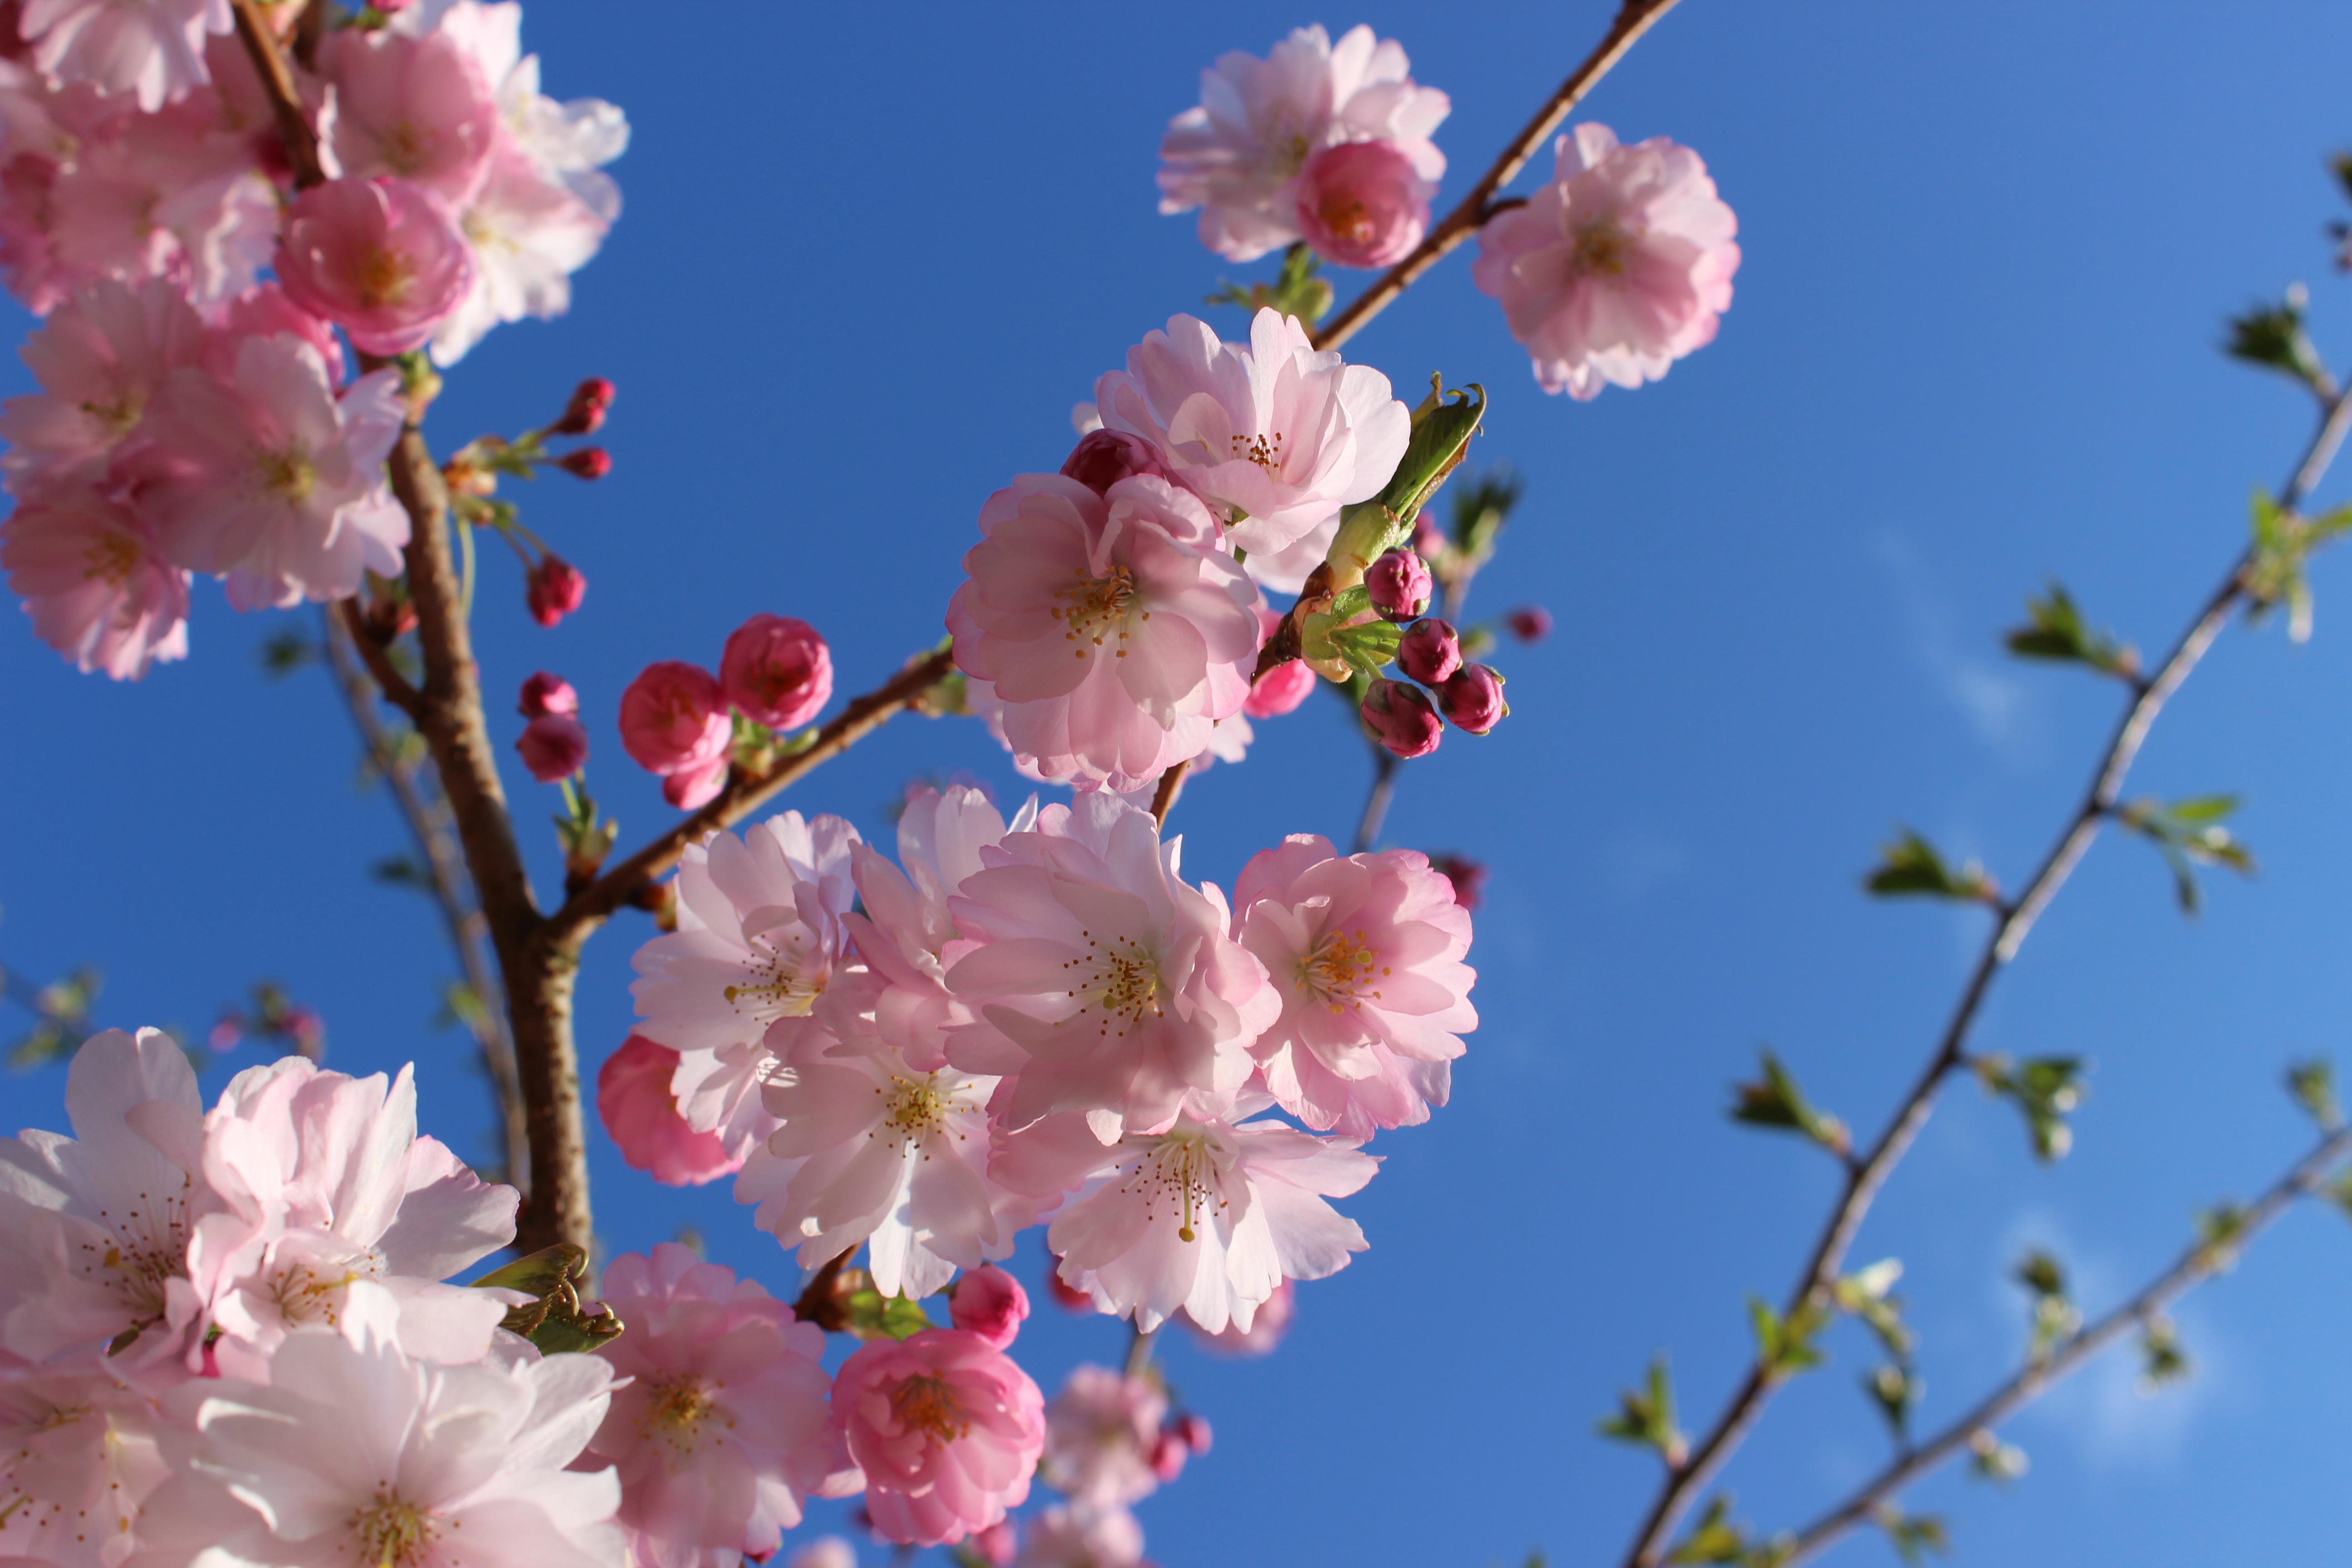 Free Images Tree Branch Flower Petal Spring Produce Botany